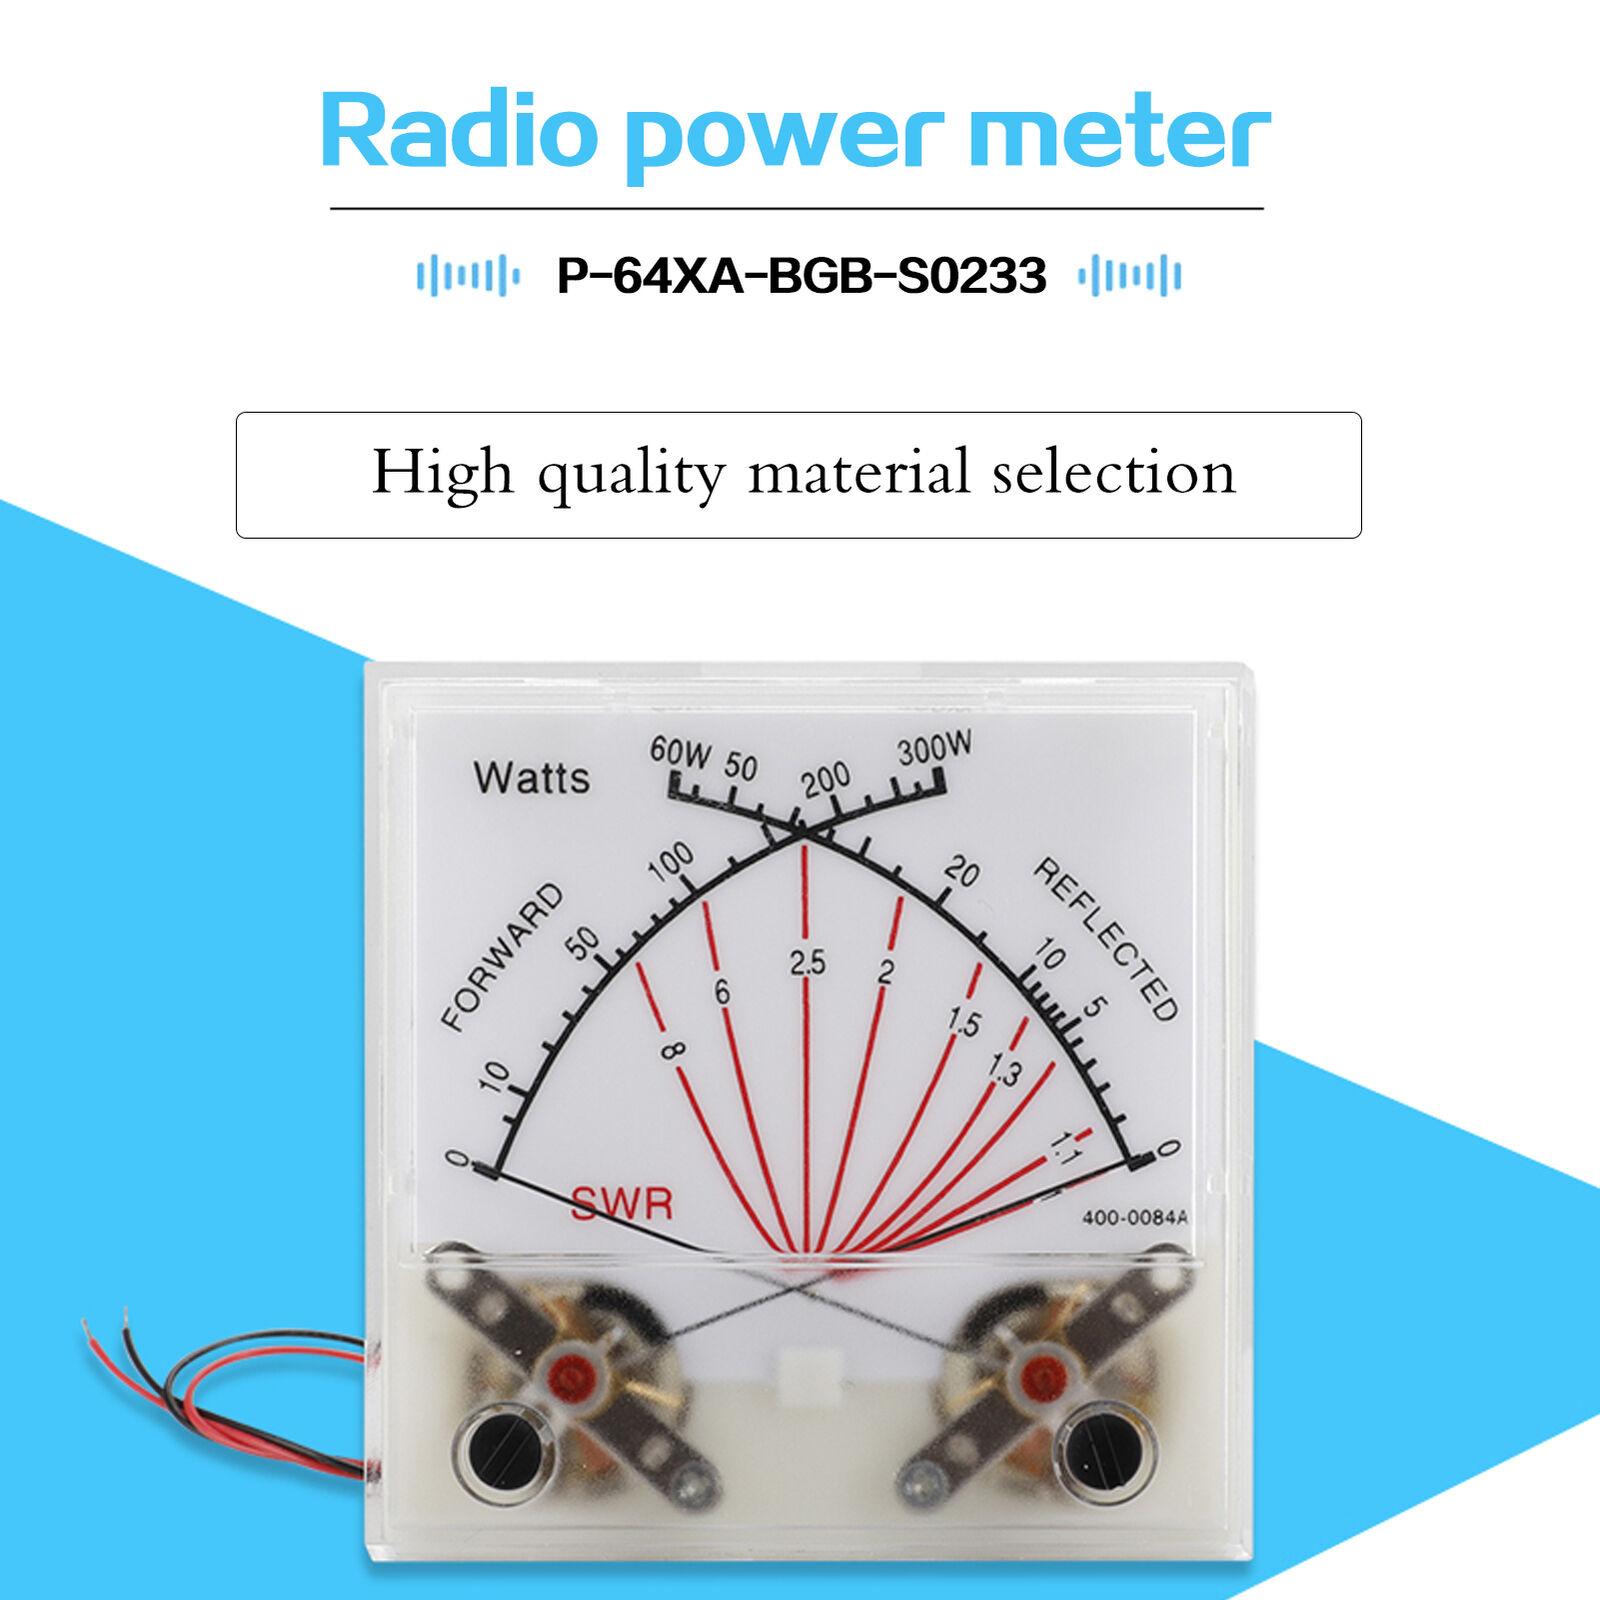 swirrm Standing Wave Radio Station Dual-Pin Power Meter Peak Reading SWR Wattmeter